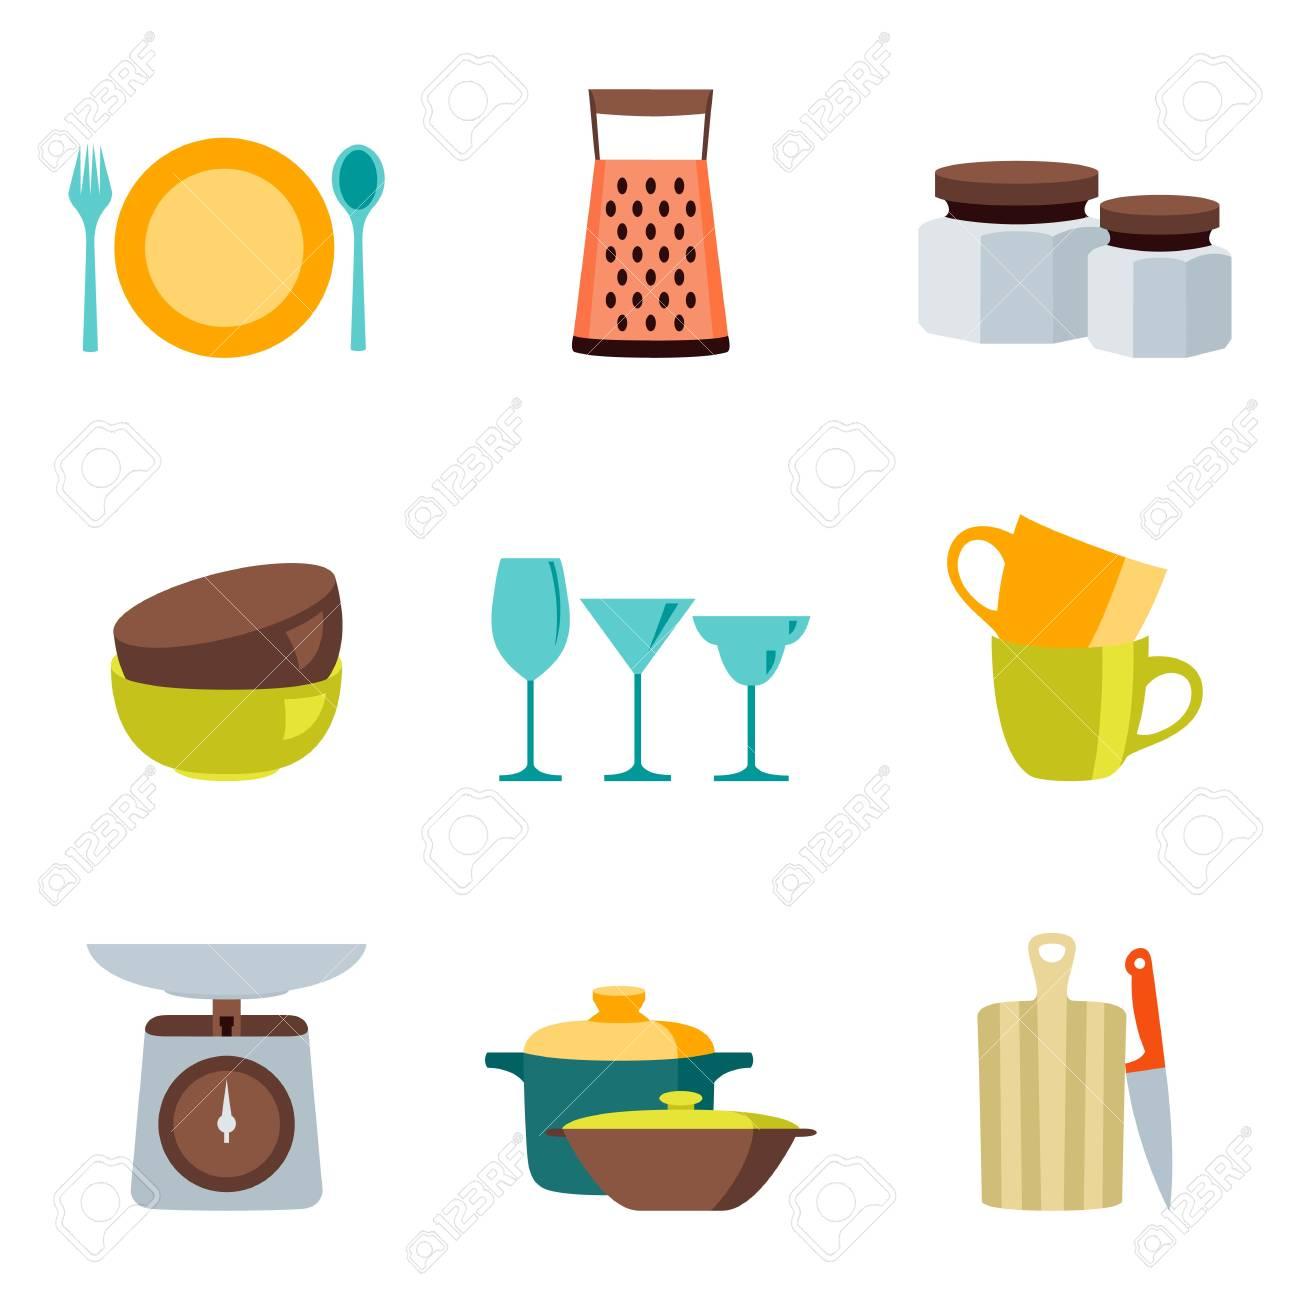 Icones De Couleur Design Plat Ustensiles De Cuisine Vector